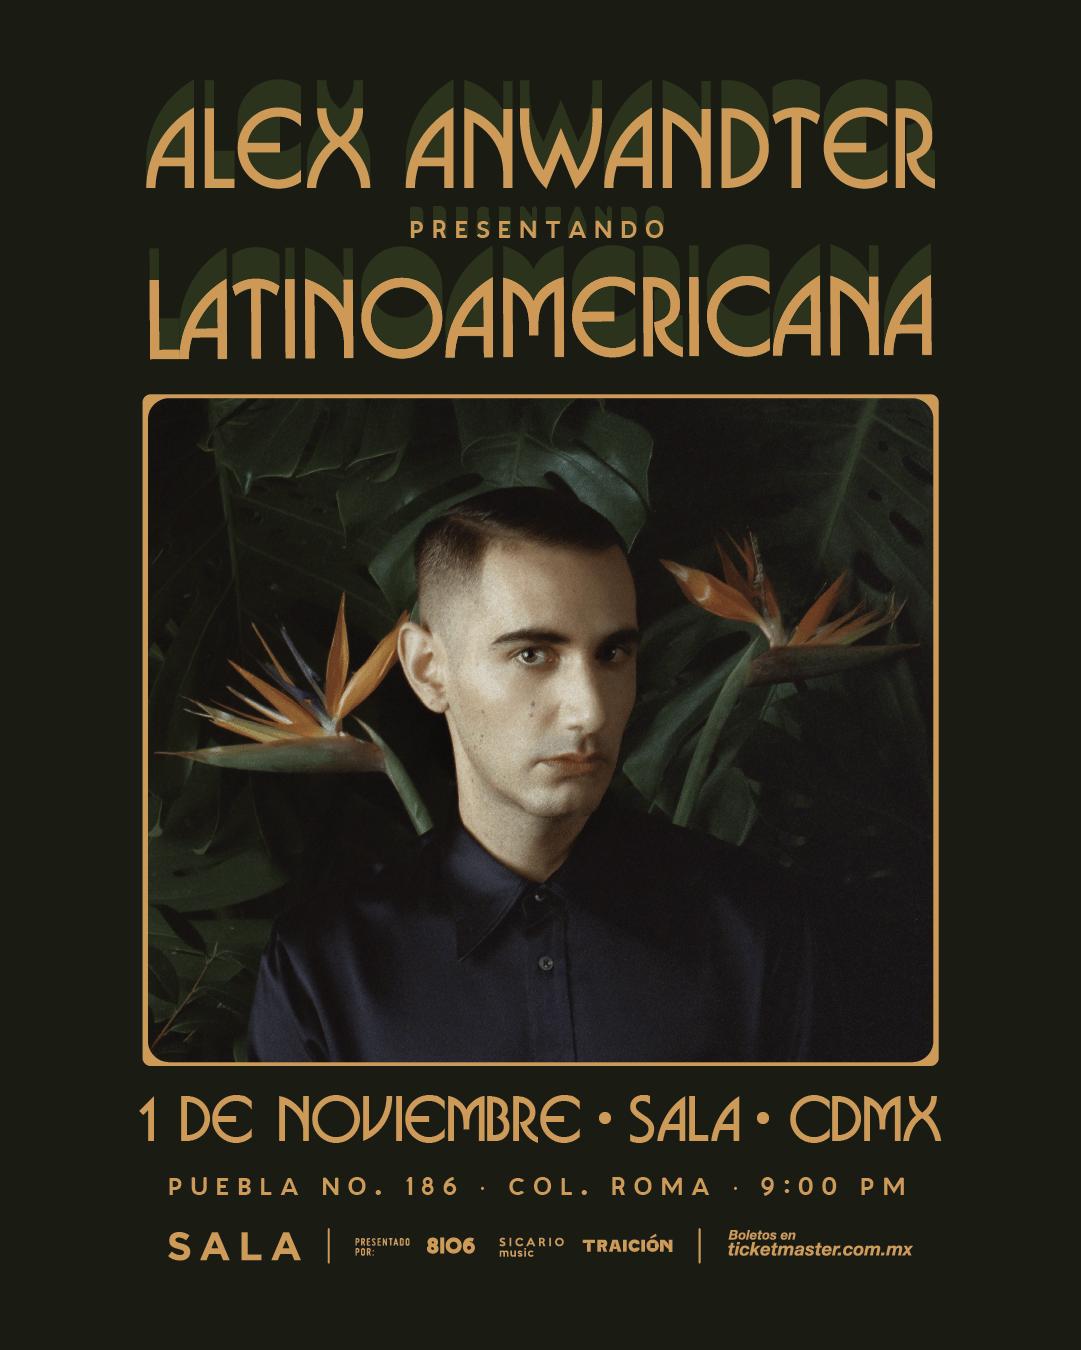 alex-anwandter-latinoamericana-disco-2018-resena